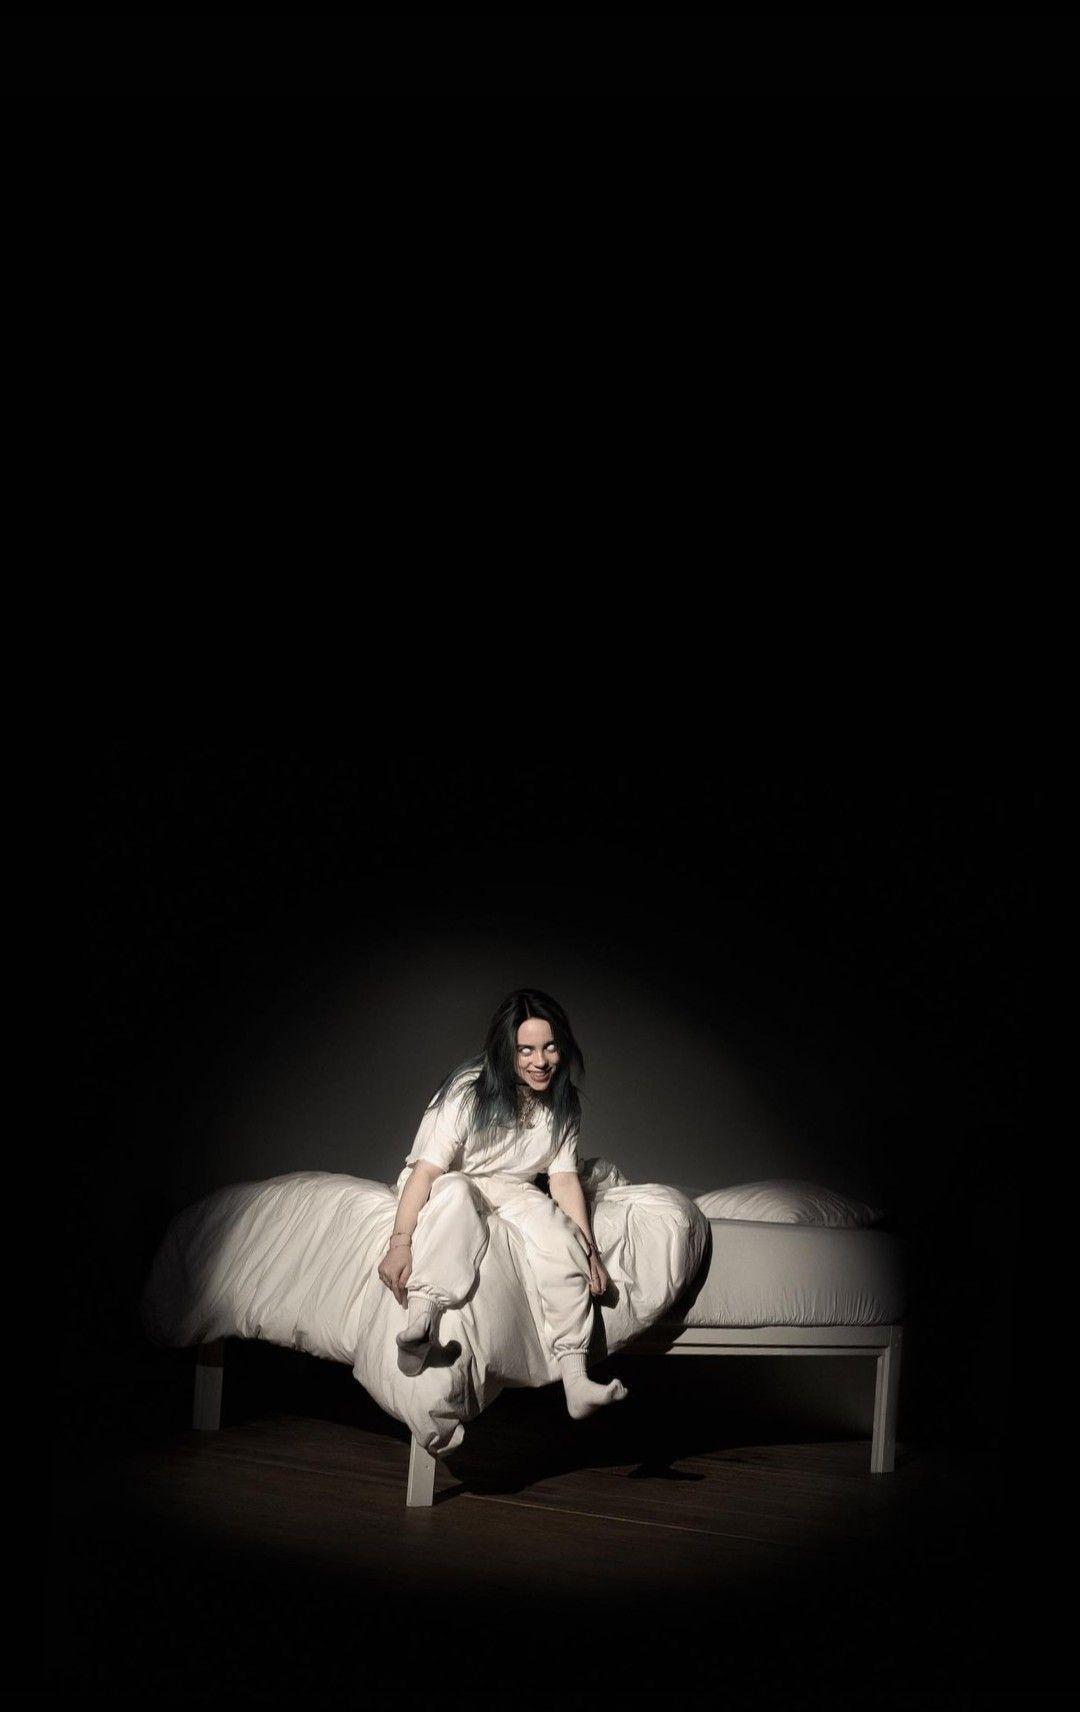 Billie Eilish Album Cover Wallpapers Top Free Billie Eilish Album Cover Backgrounds Wallpaperaccess